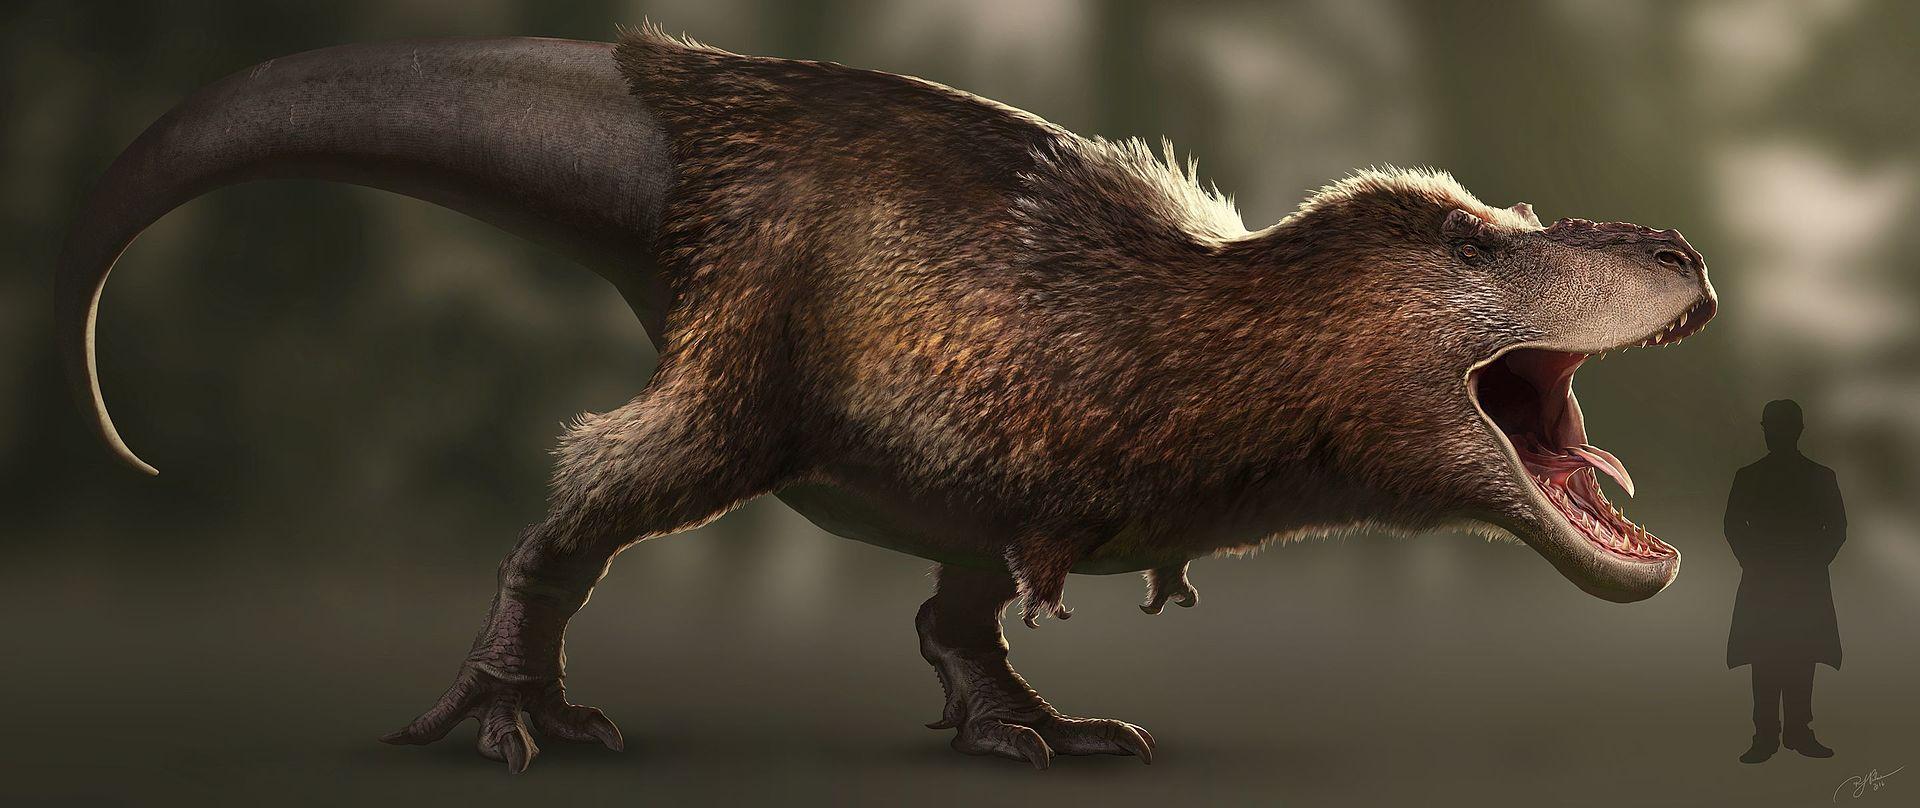 Rjpalmer_tyrannosaurusrex_001